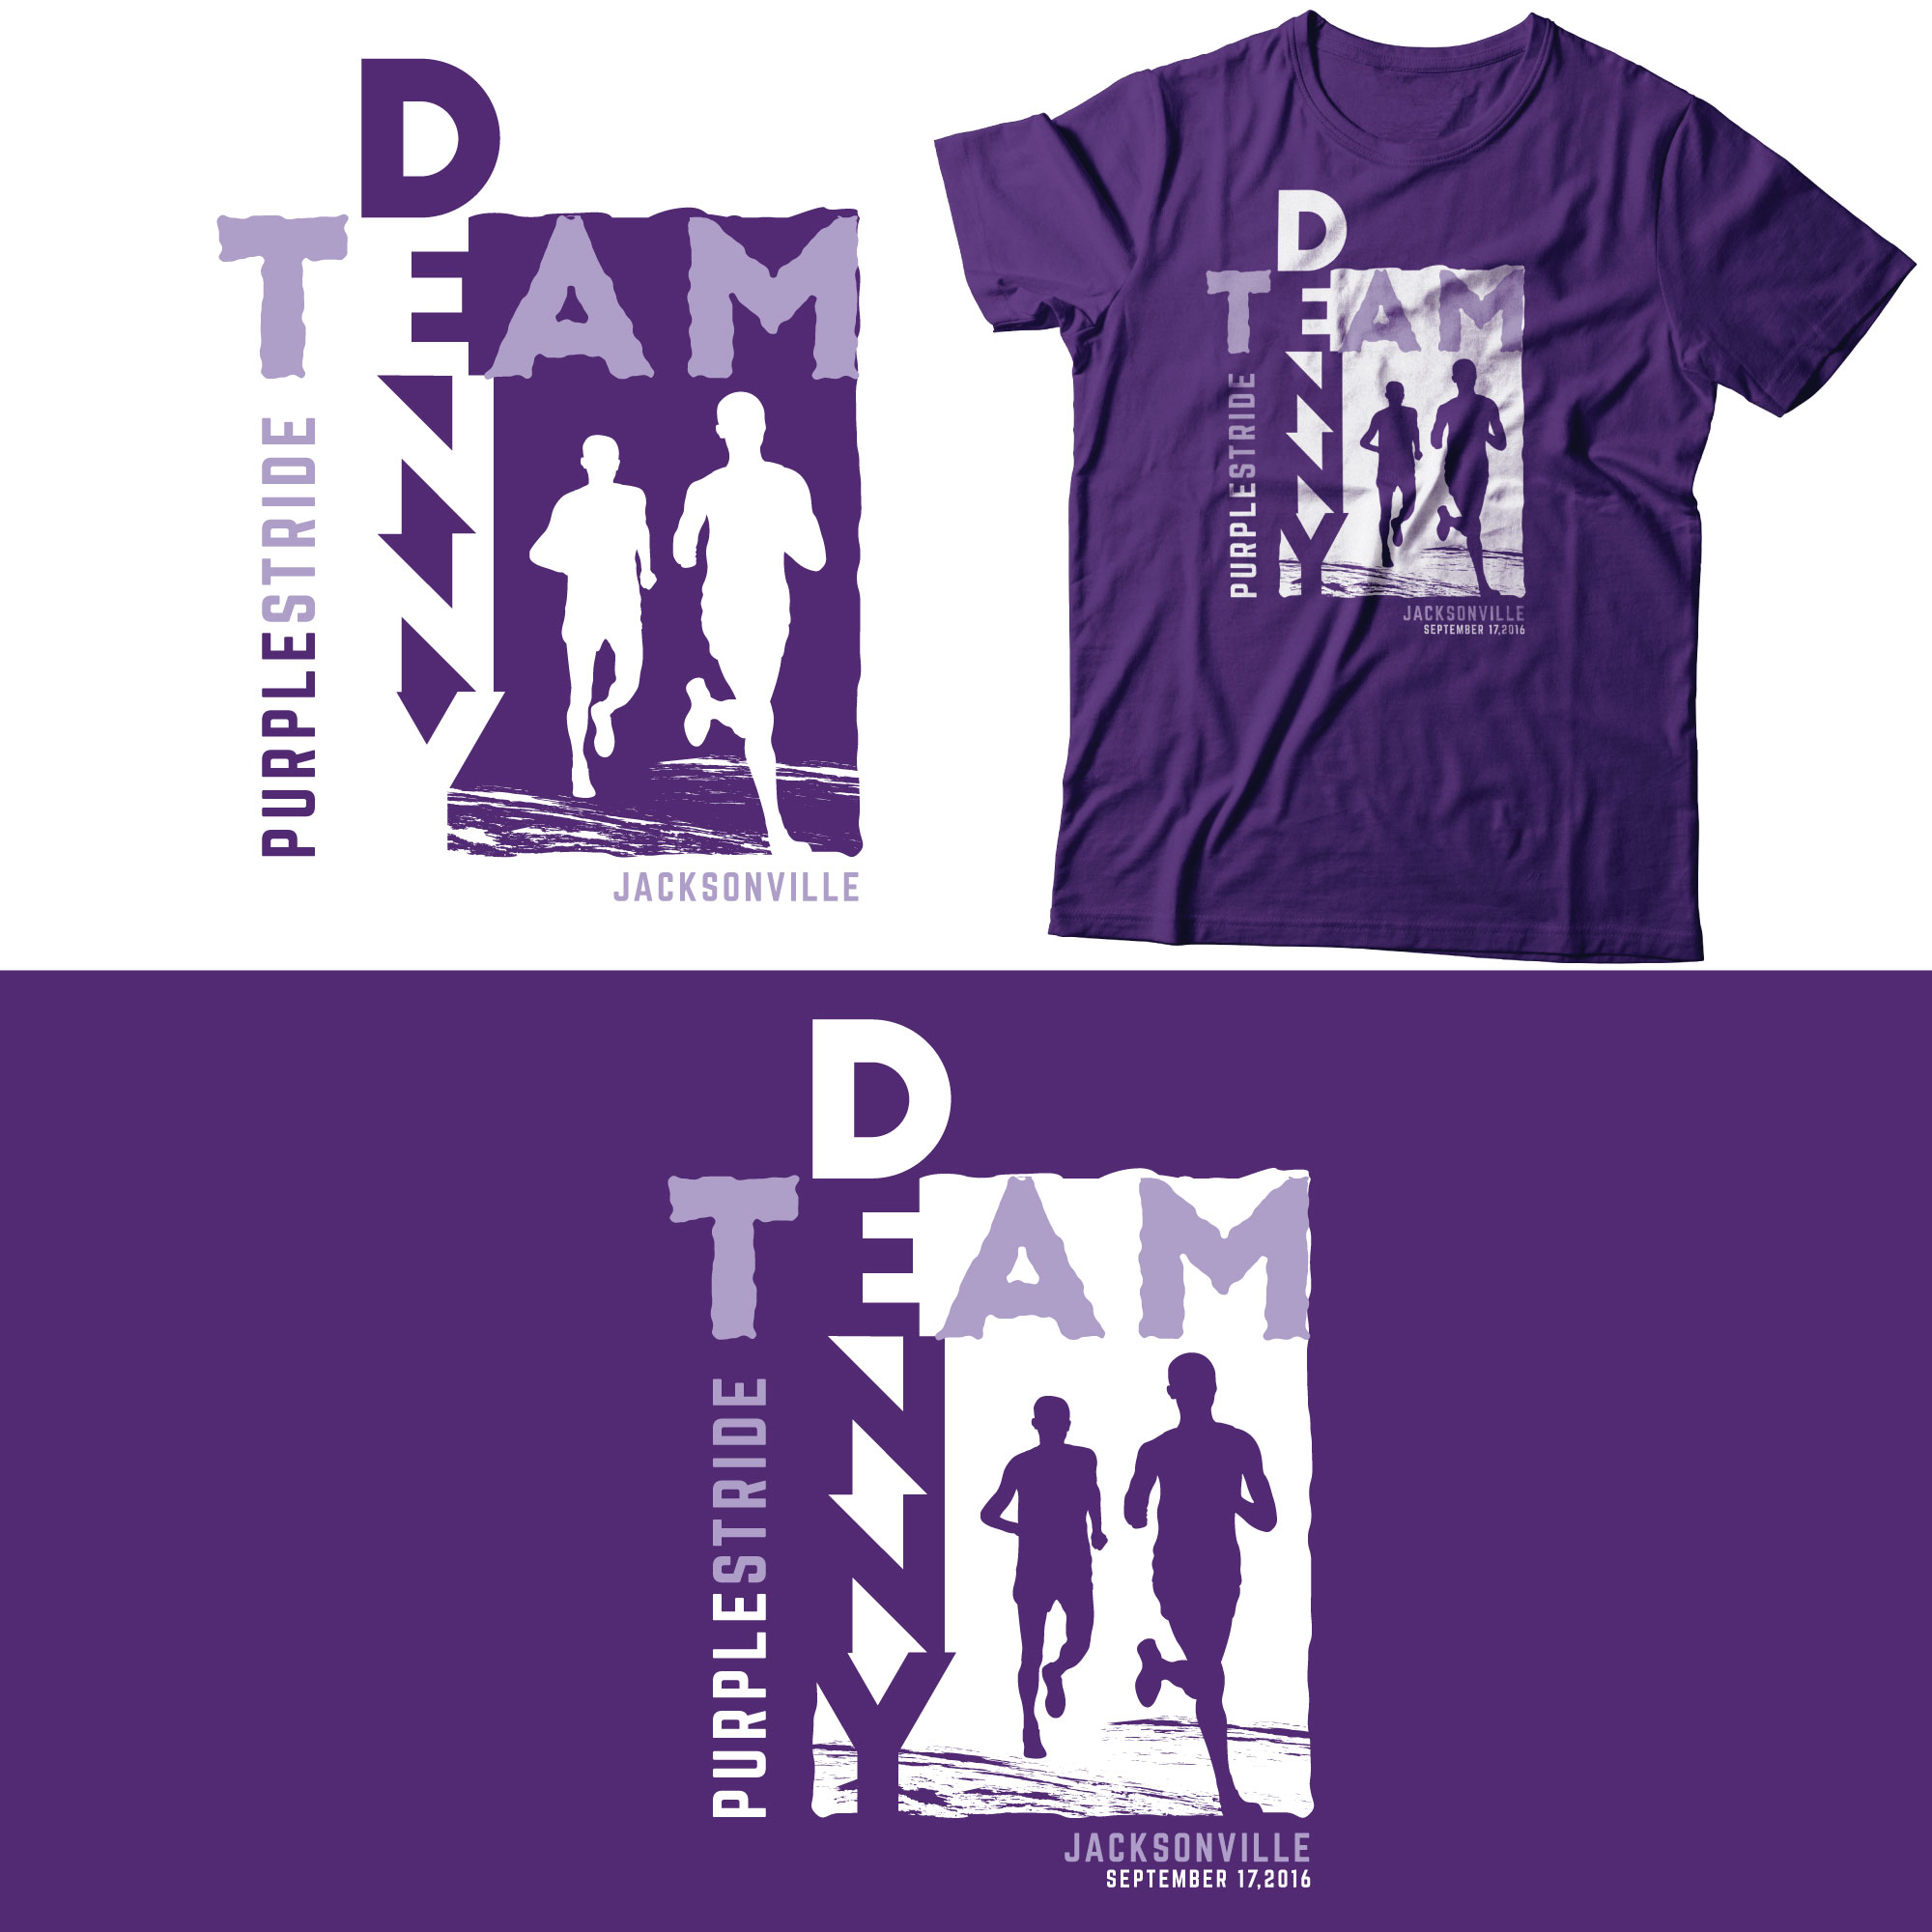 Logo Design by Roza Apostolska - Entry No. 29 in the Logo Design Contest  Logo Design for Team Denny front t shirt.